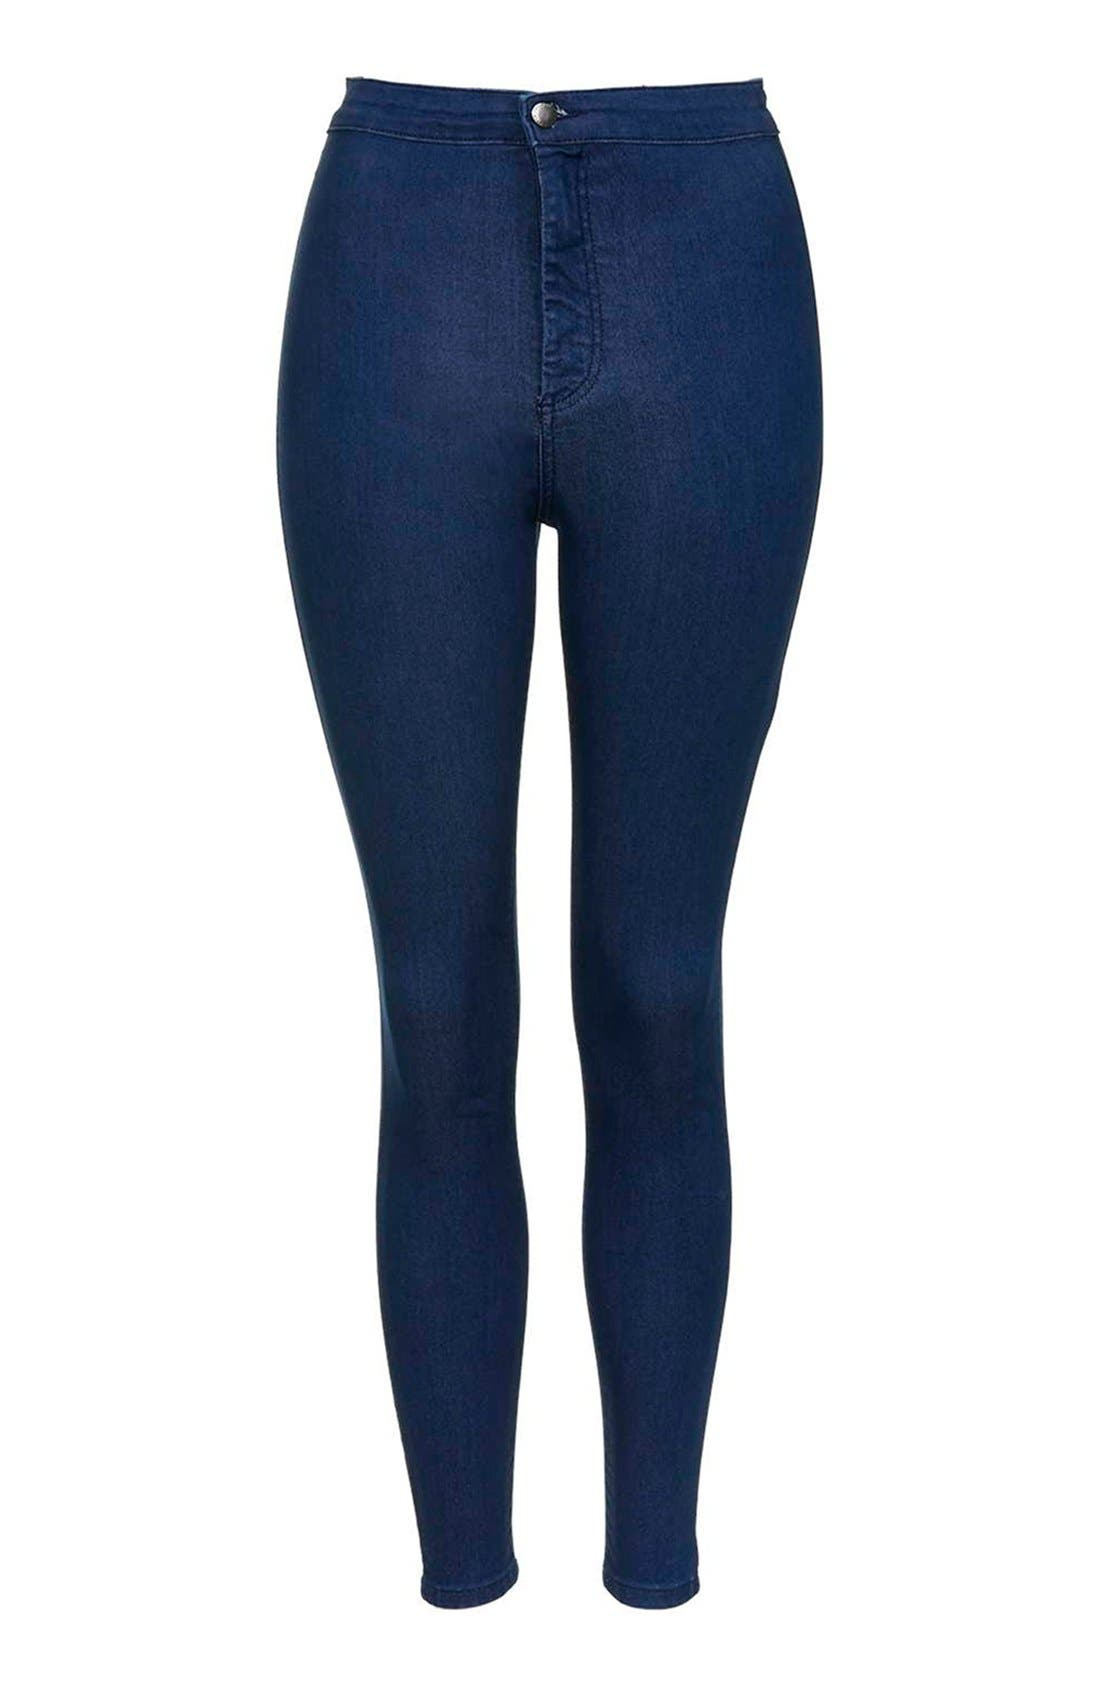 Alternate Image 4  - Topshop 'Joni' Super Skinny Jeans (Petite)